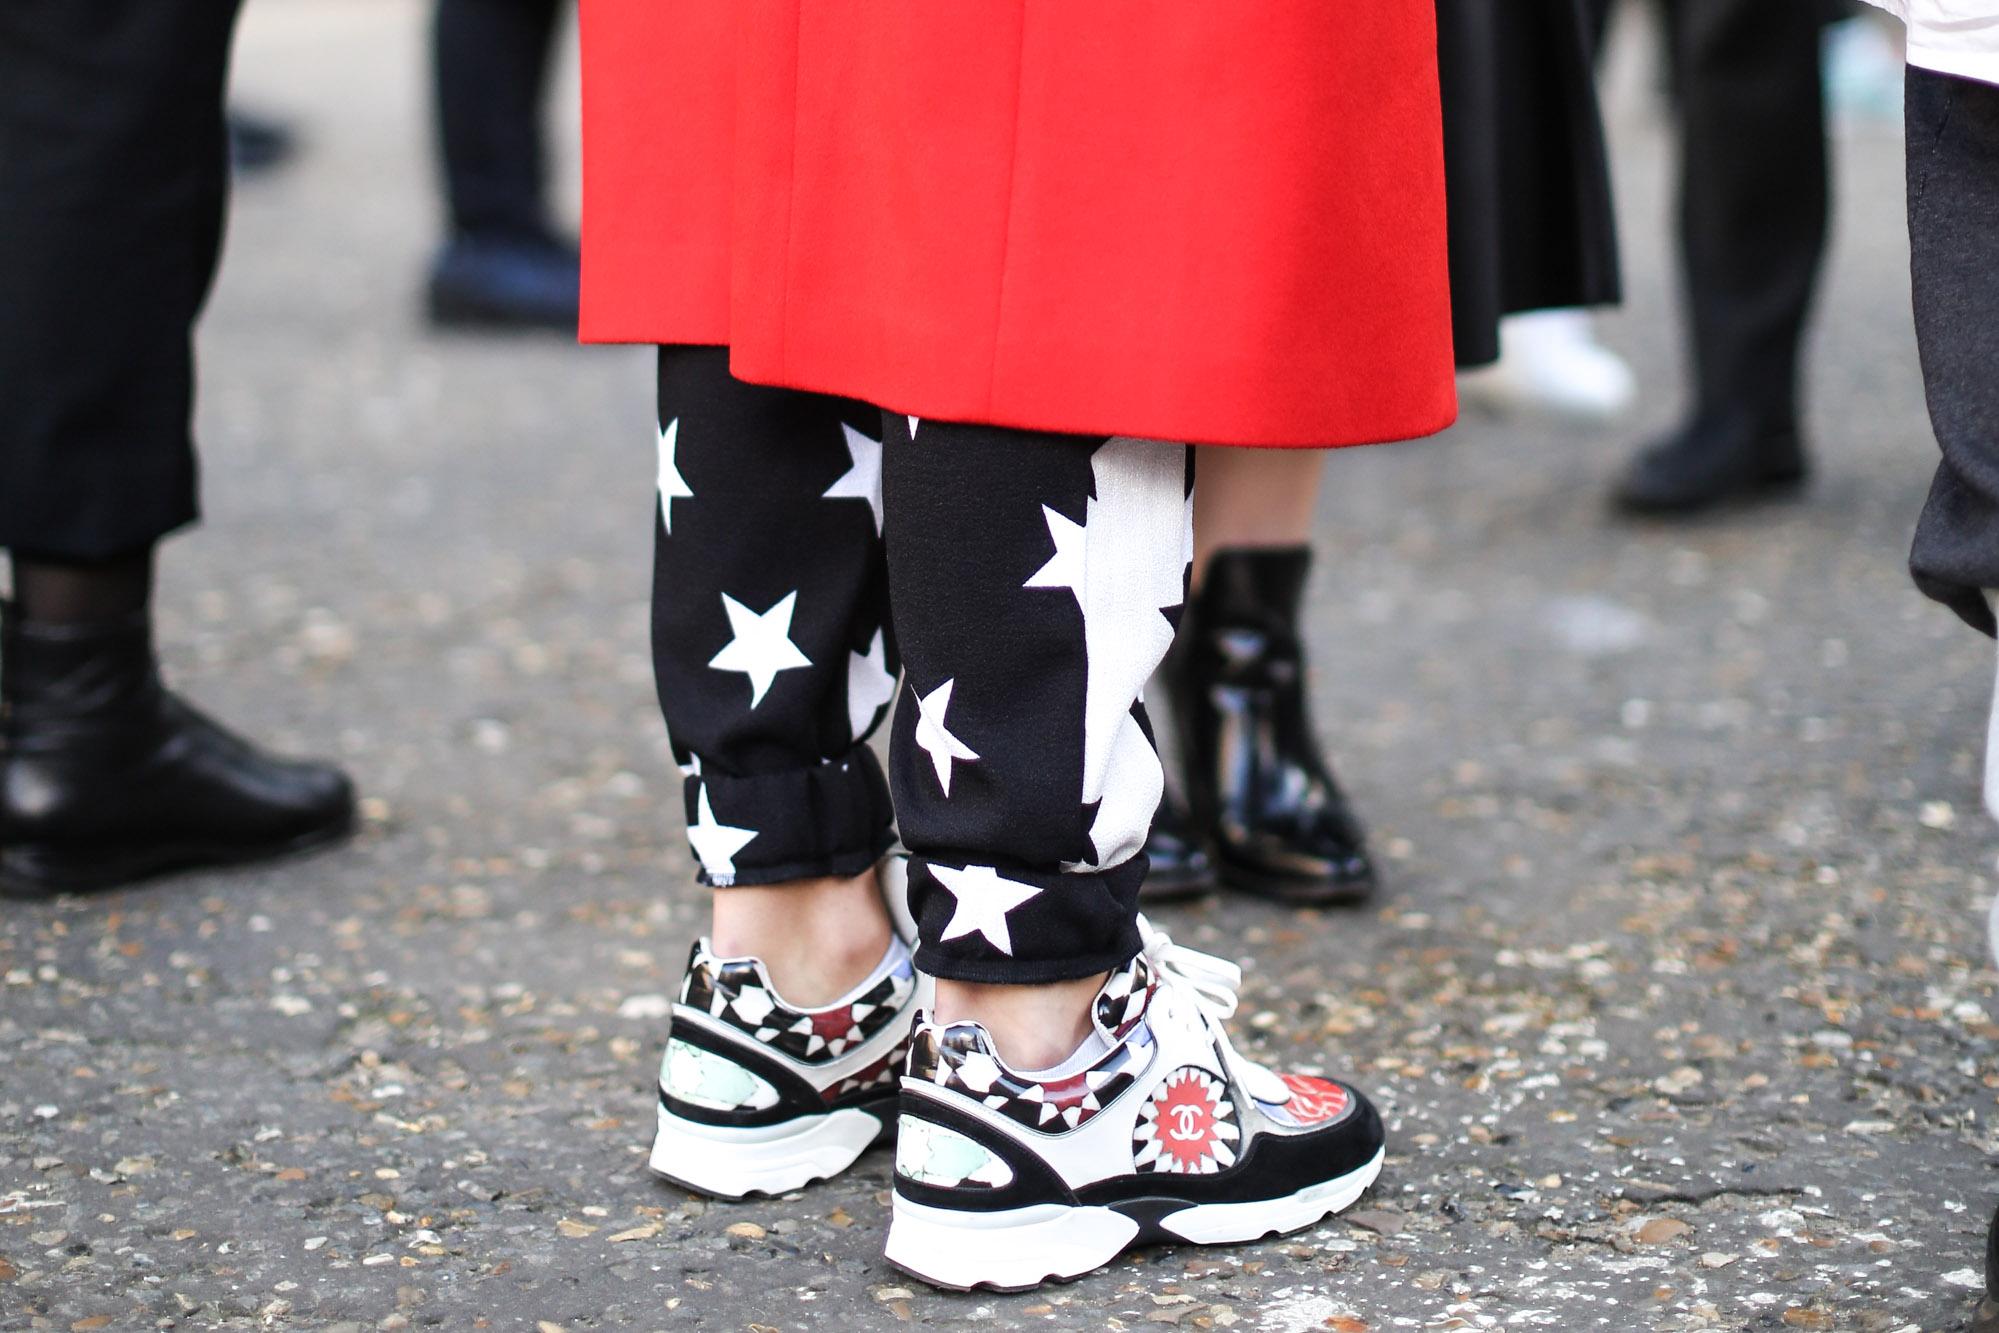 Clochet-london-fashion-week-streetstyle-burberry-25